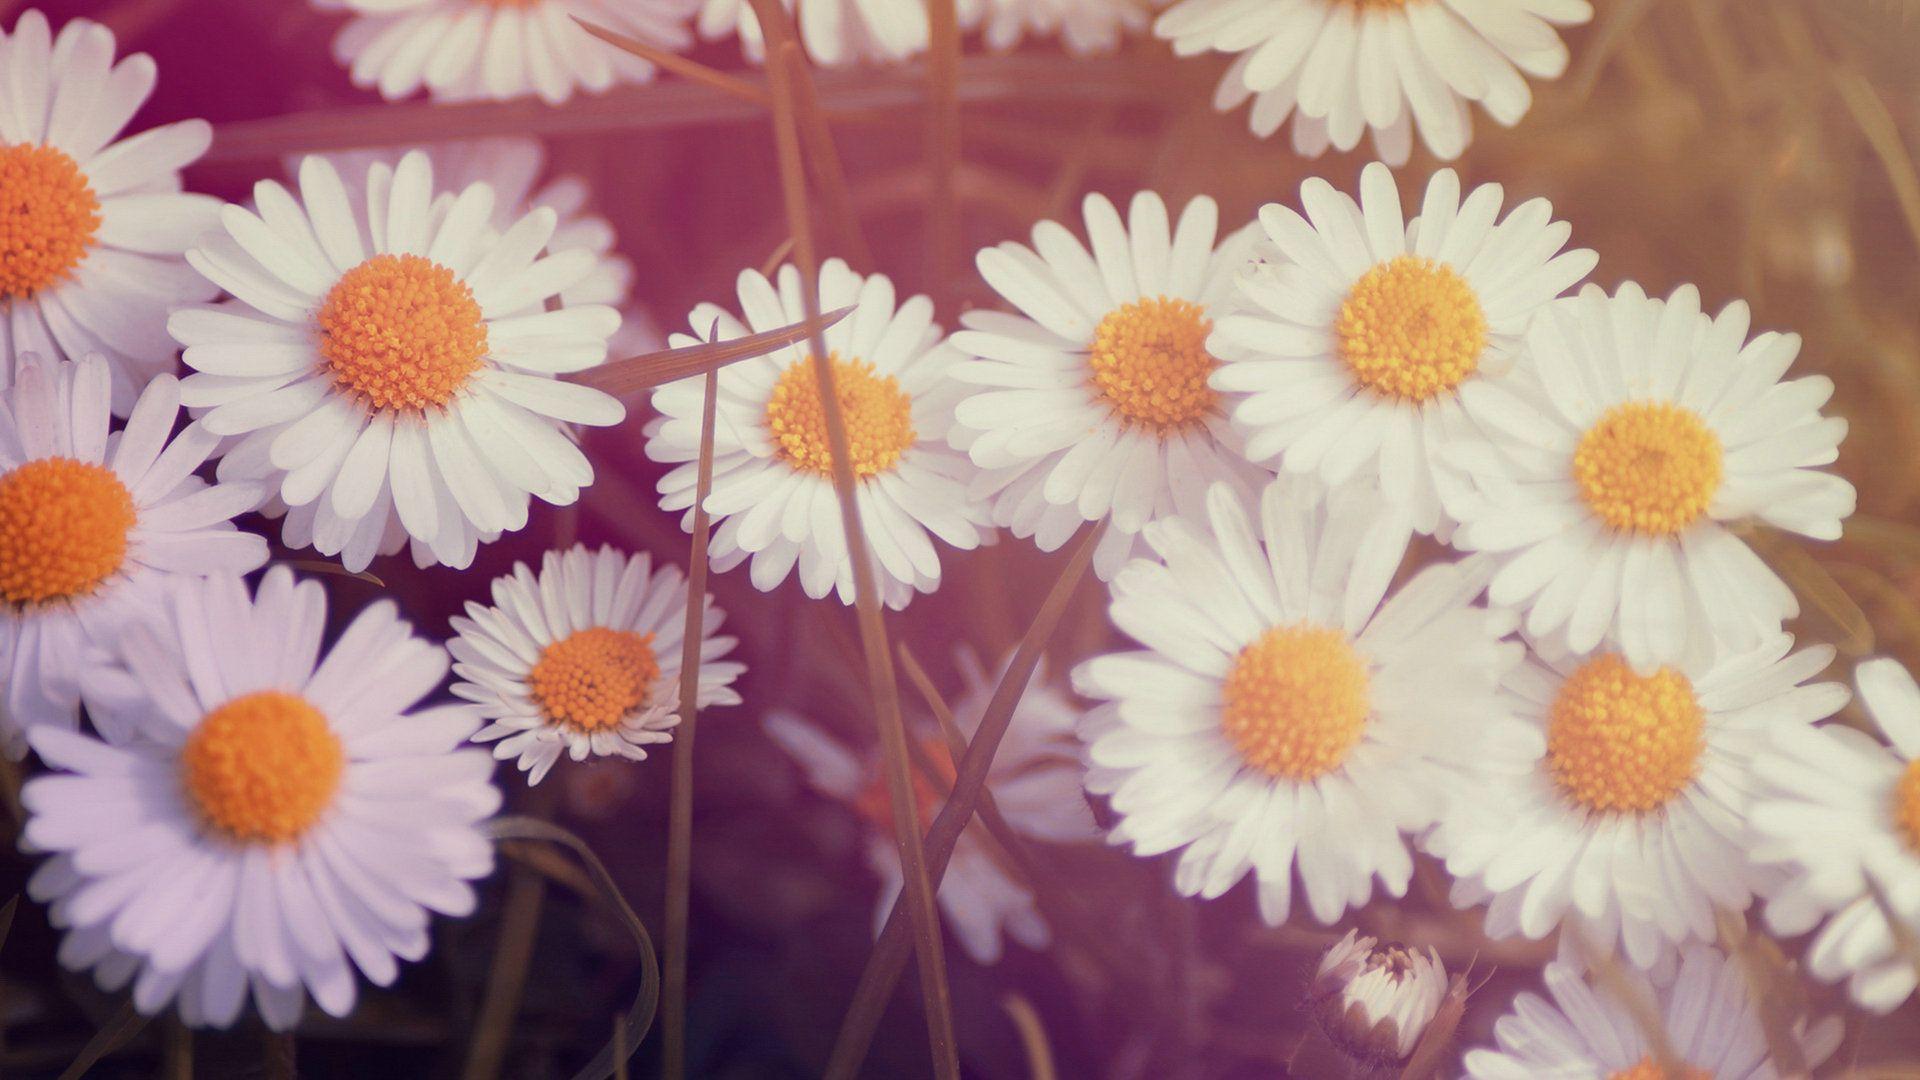 Best Vintage Flowers Wallpaper Ideas On Pinterest Flower